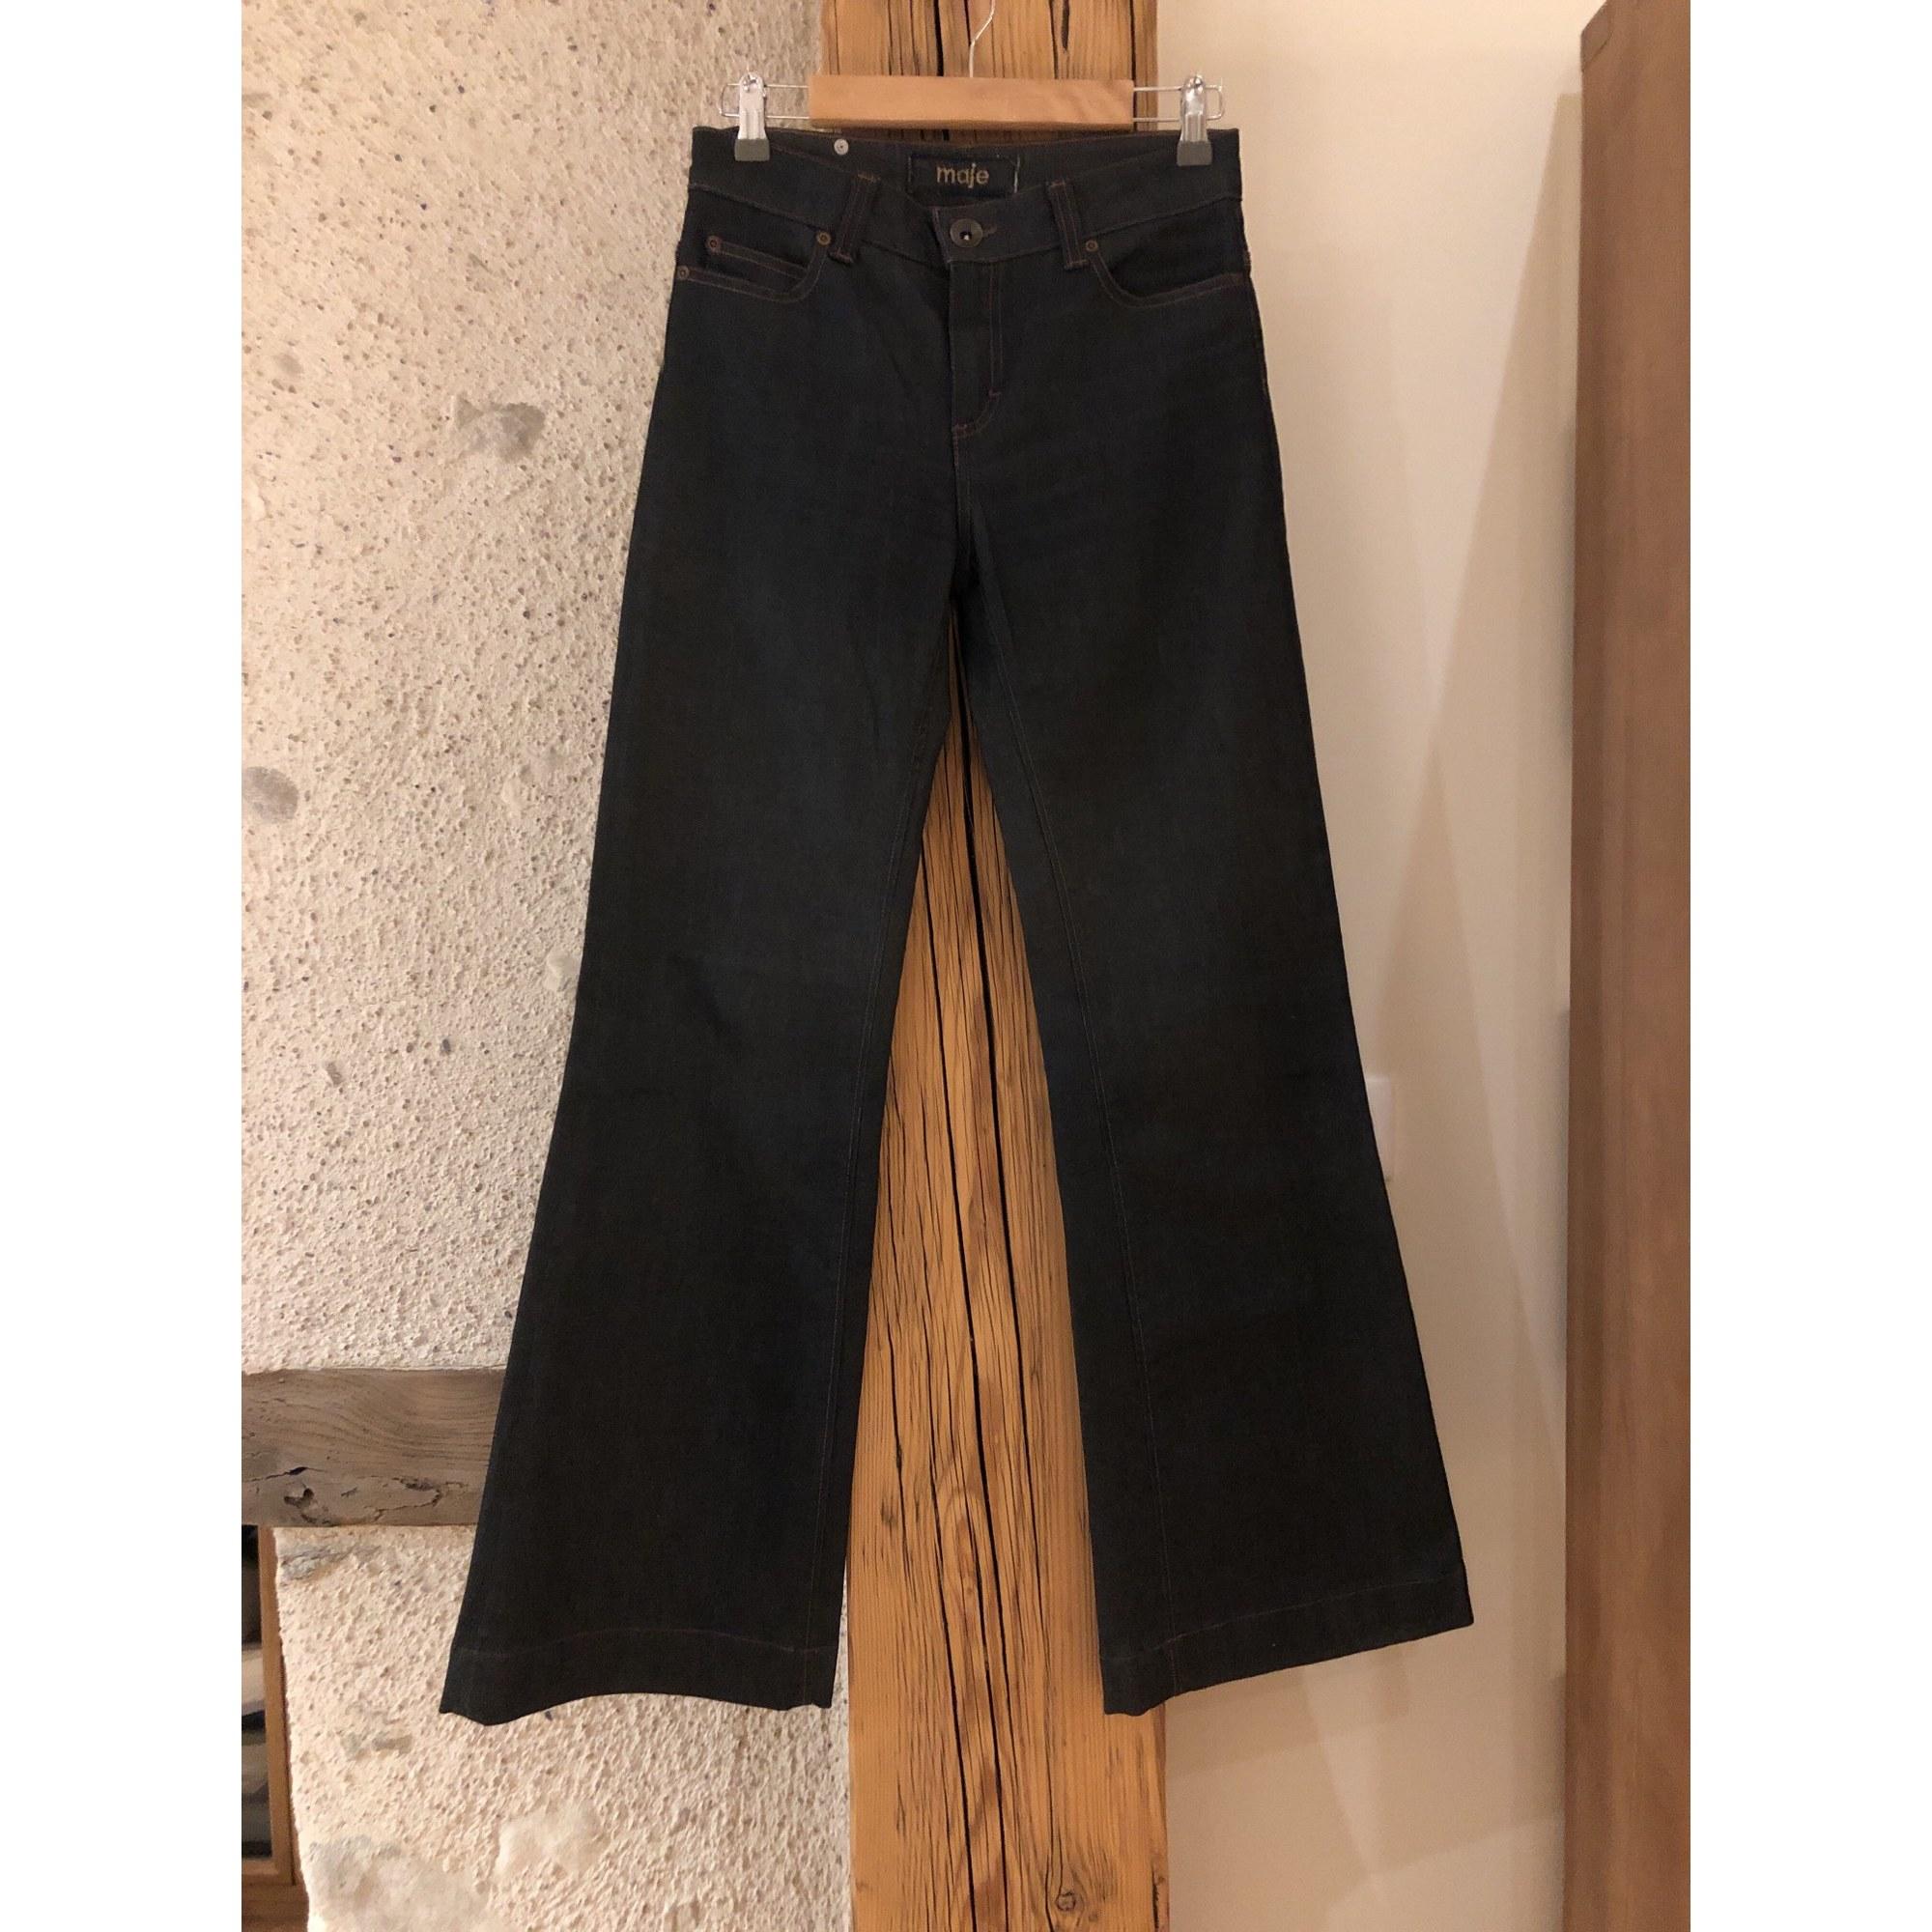 Jeans évasé, boot-cut MAJE Bleu, bleu marine, bleu turquoise